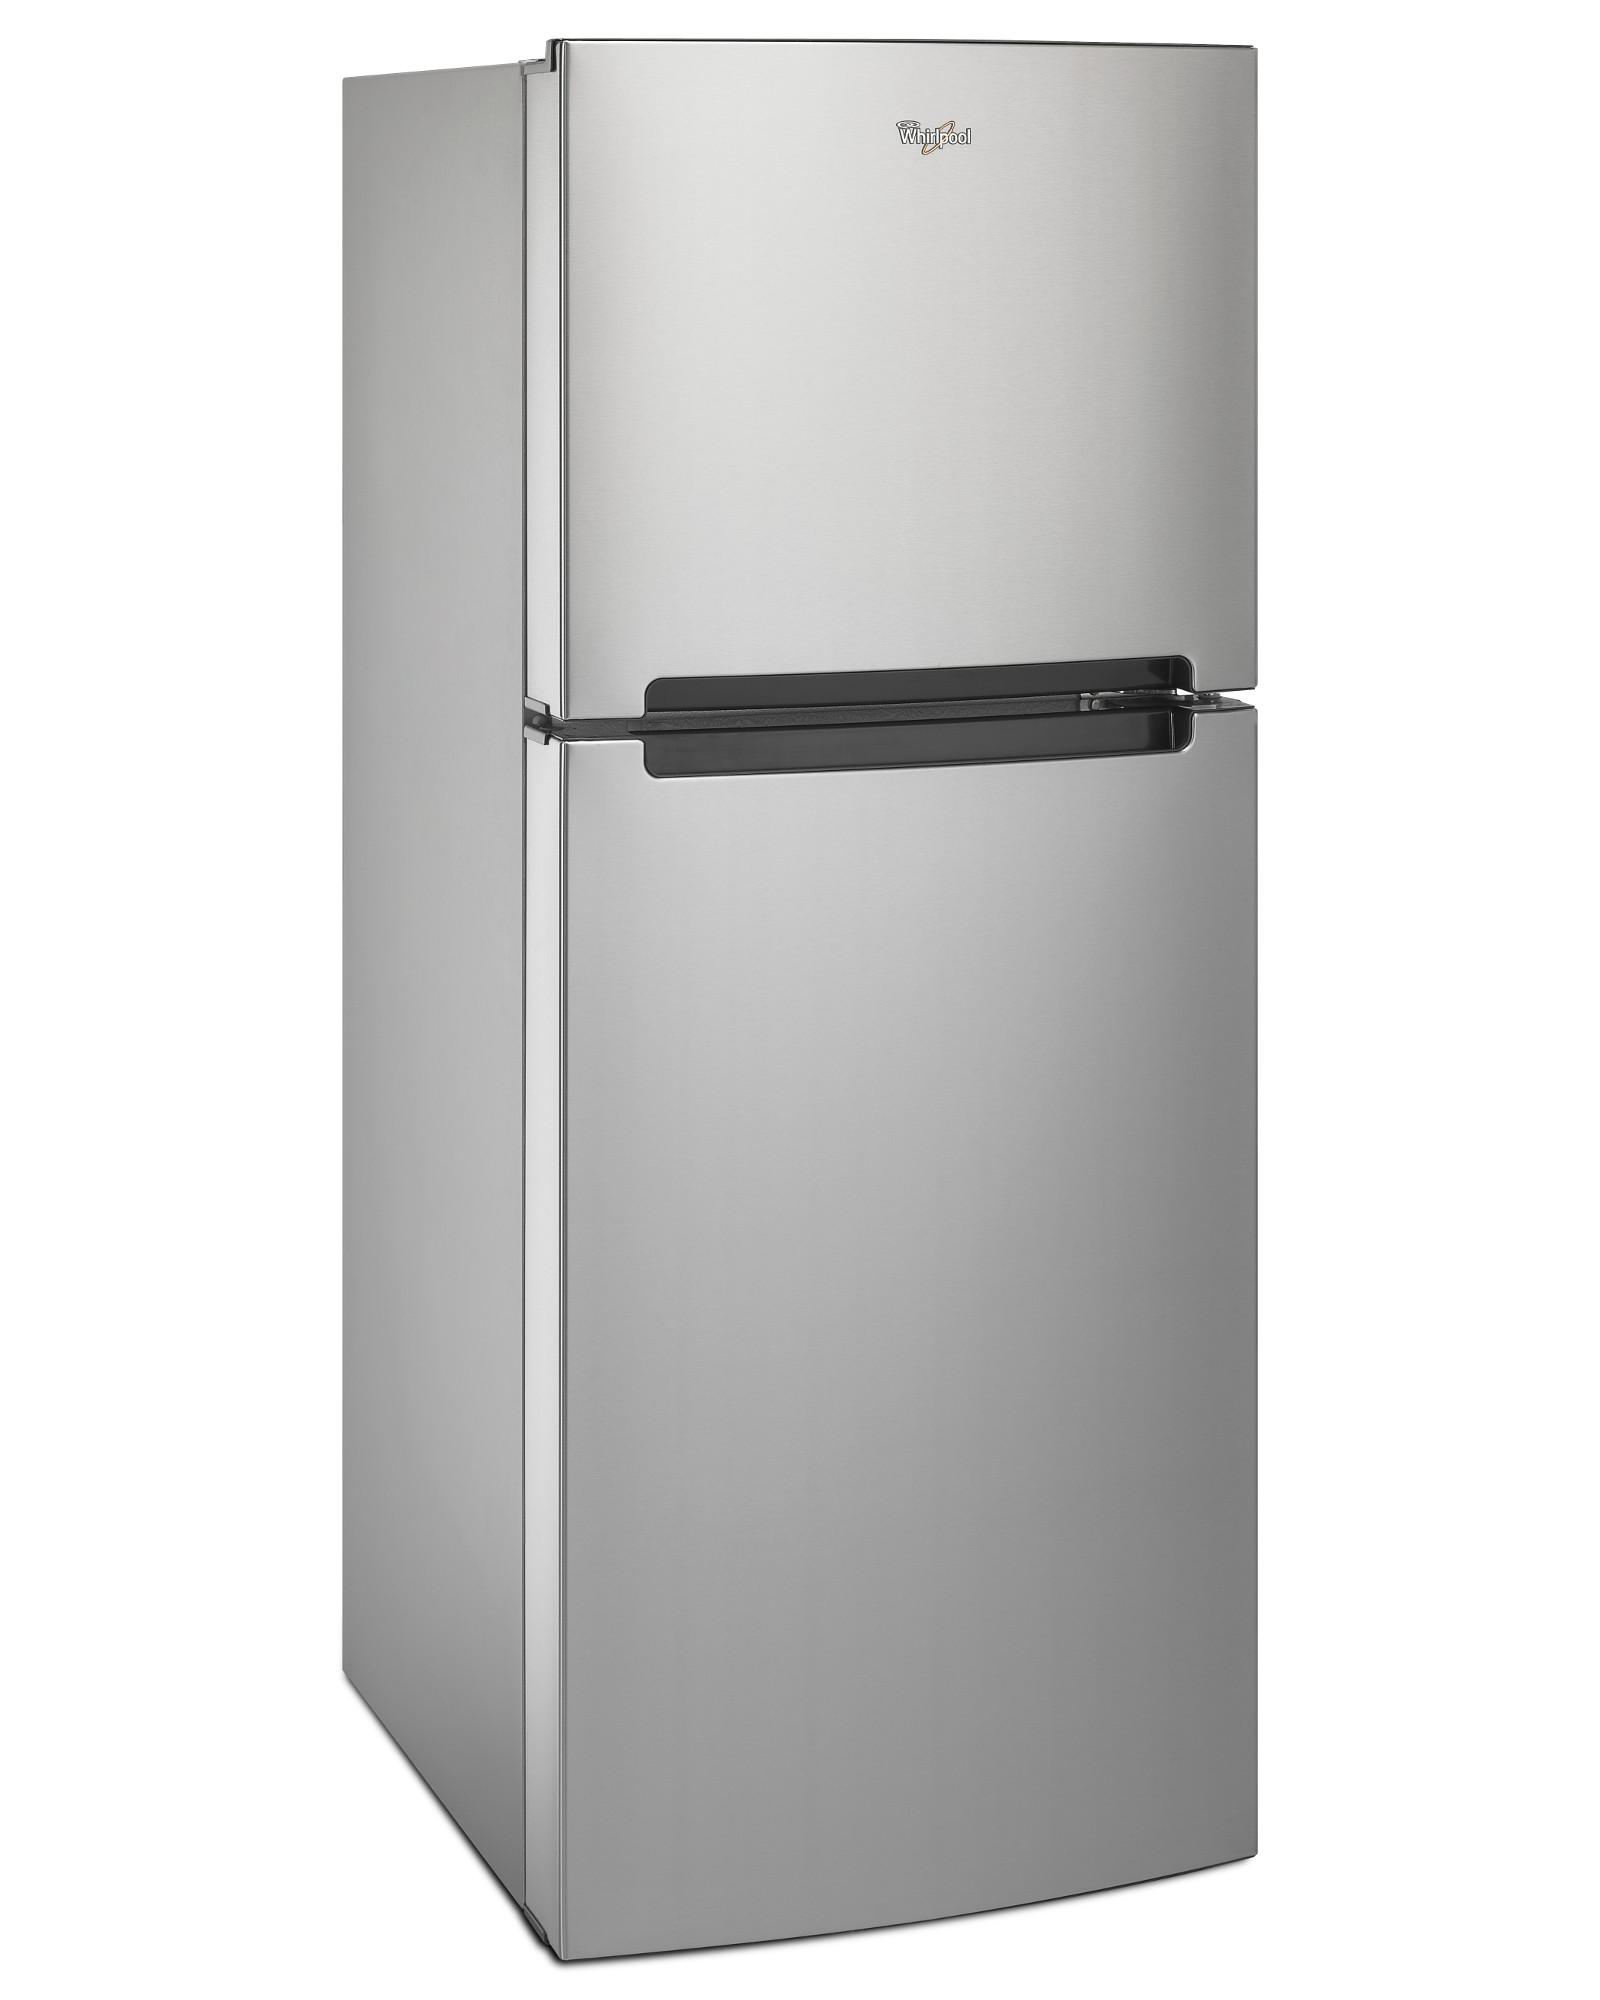 Whirlpool 11 cu. ft. Top Freezer Refrigerator - Stainless Steel